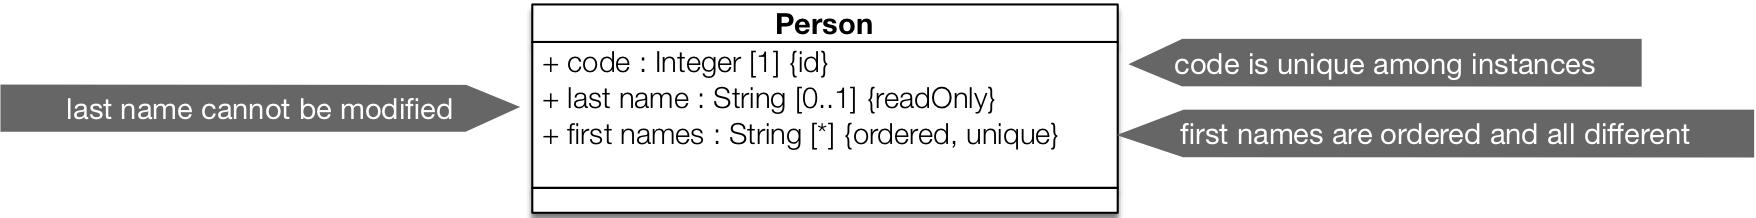 src/images/person-properties.png